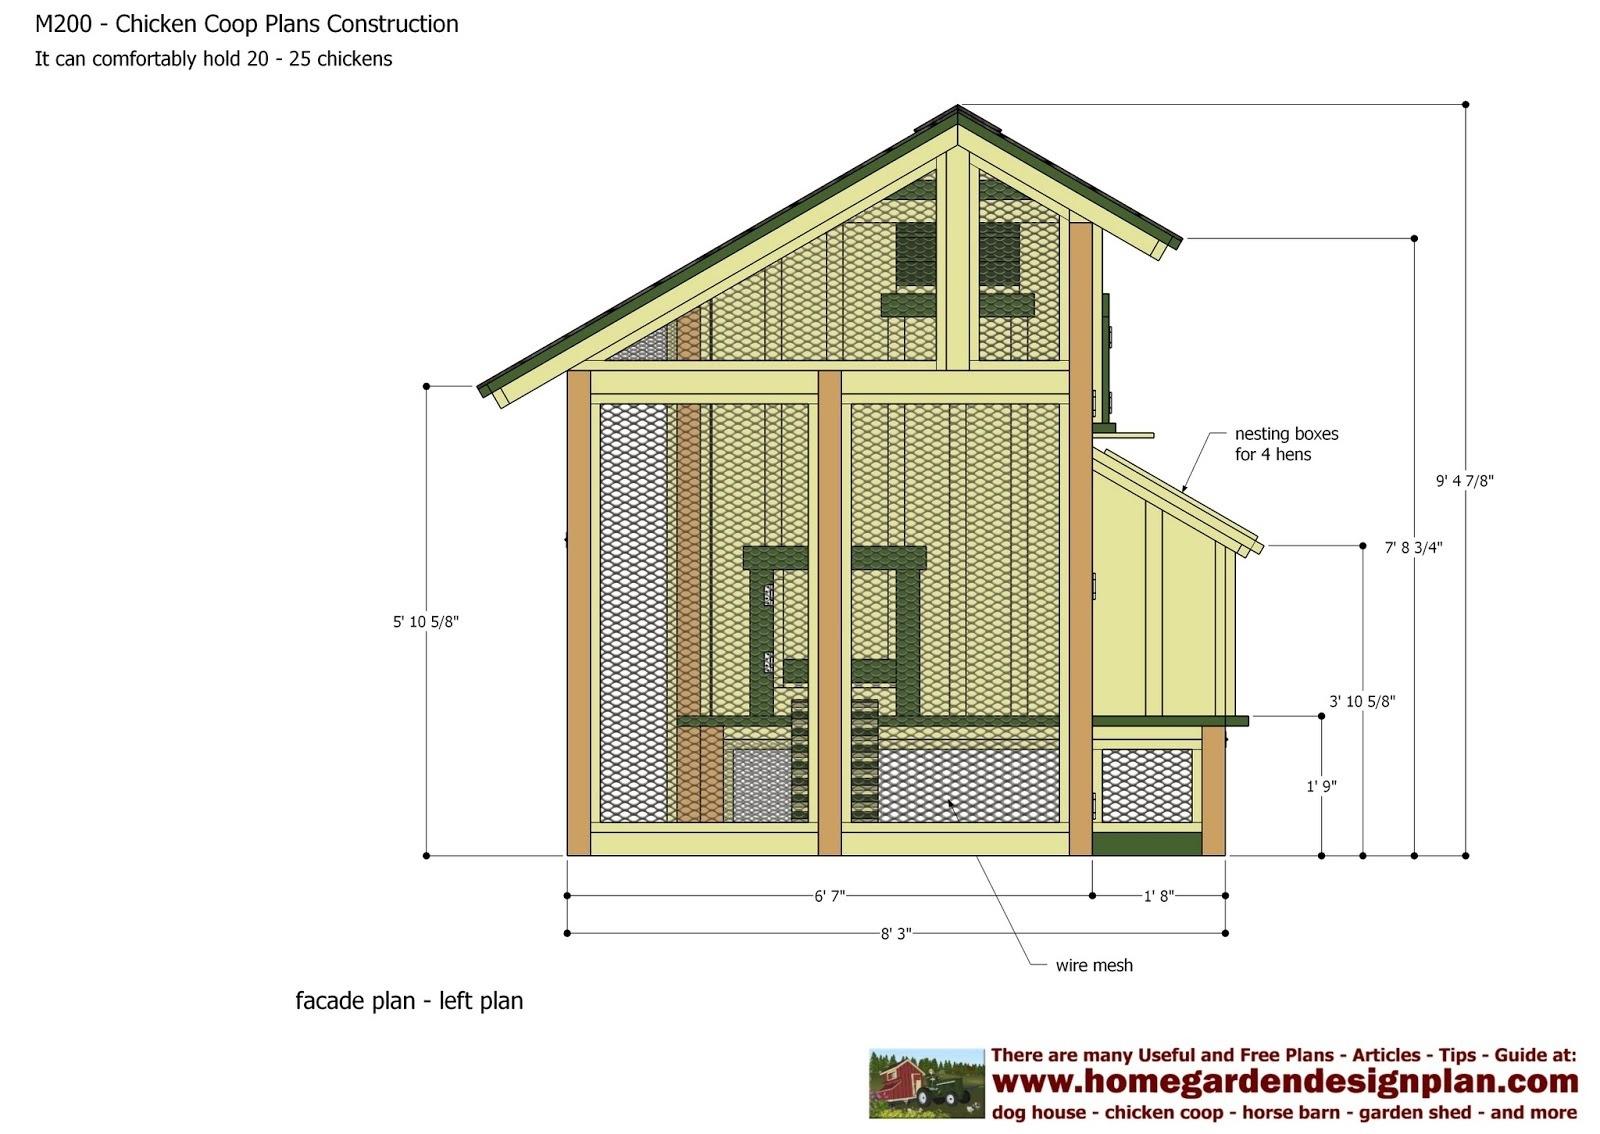 Free Printable Chicken Coop Plans   Bestprintable231118 - Free Printable Chicken Coop Plans